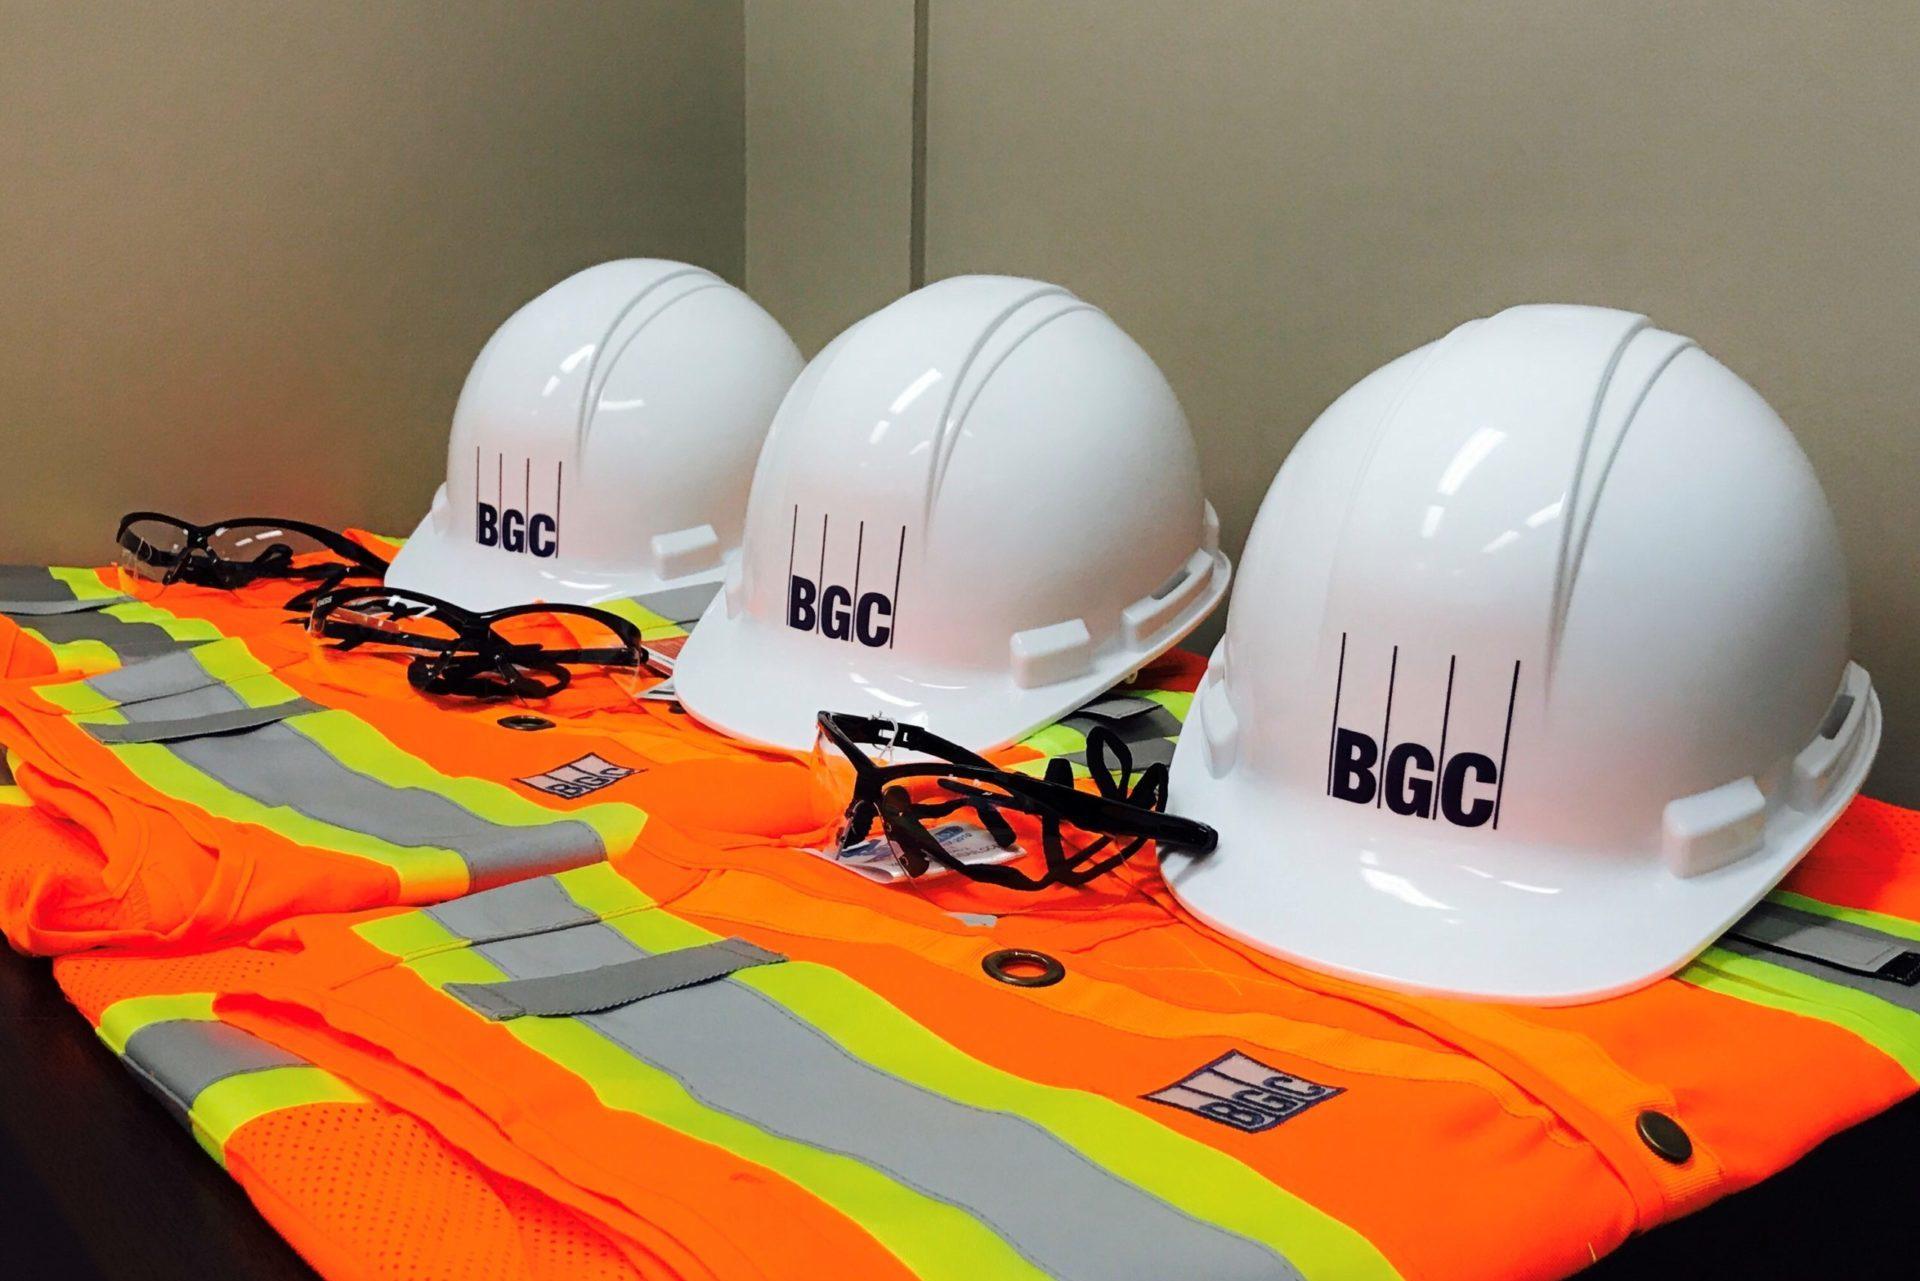 Three sets of BGC PPE